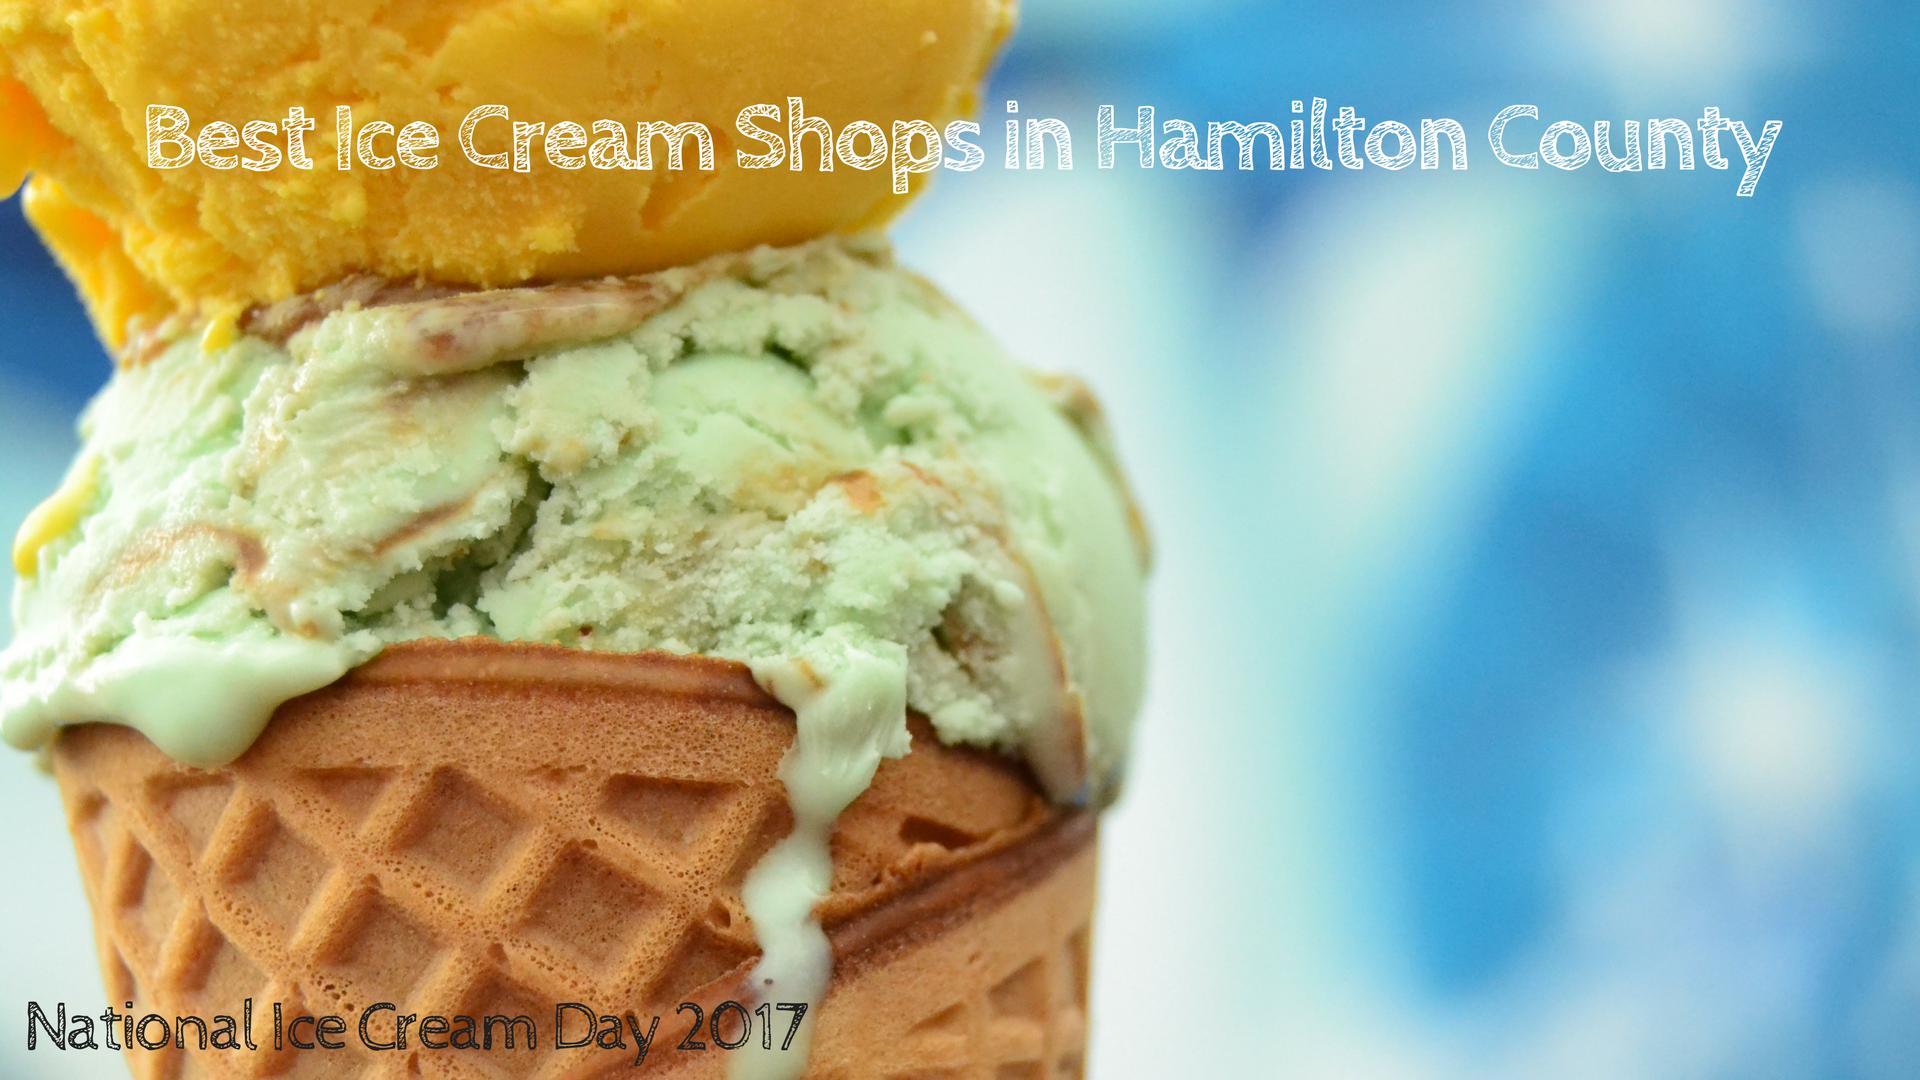 Best Ice Cream Shops in Hamilton County